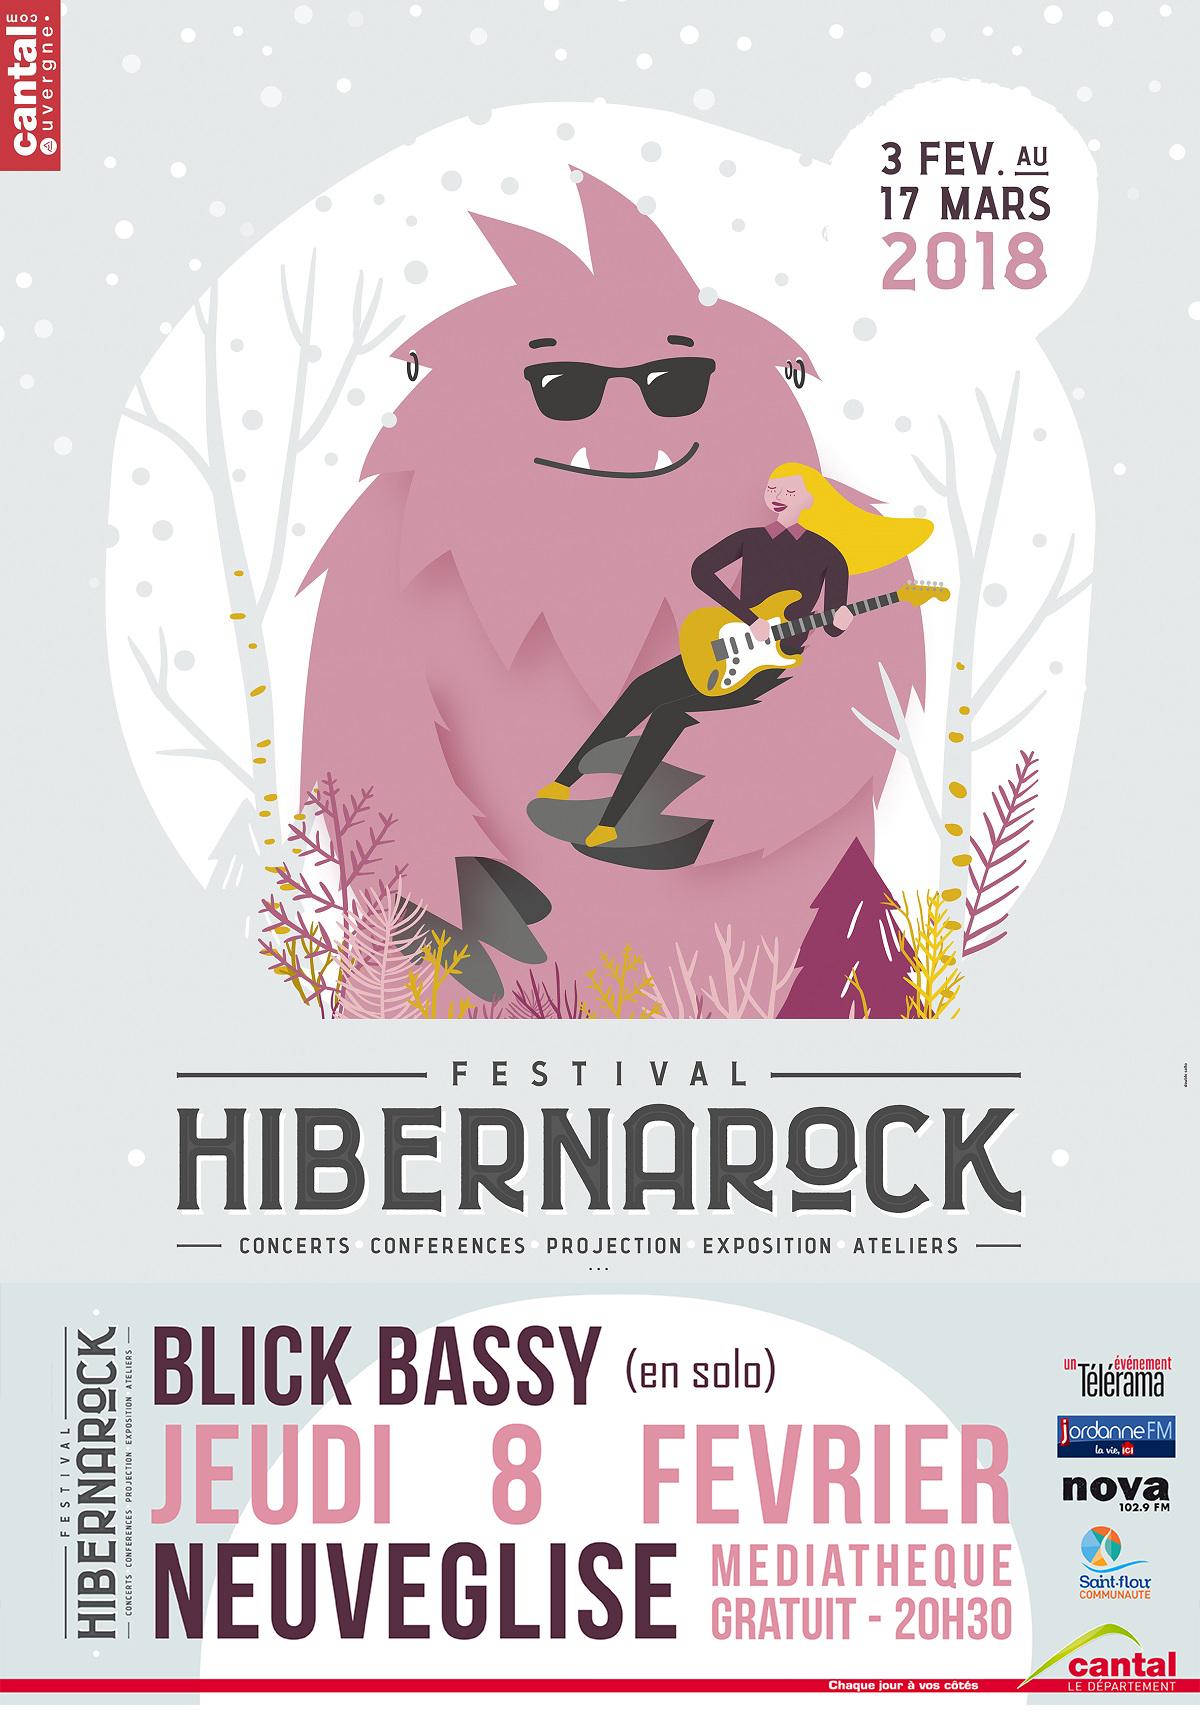 AfficheHibernarock2018_BlickBassy